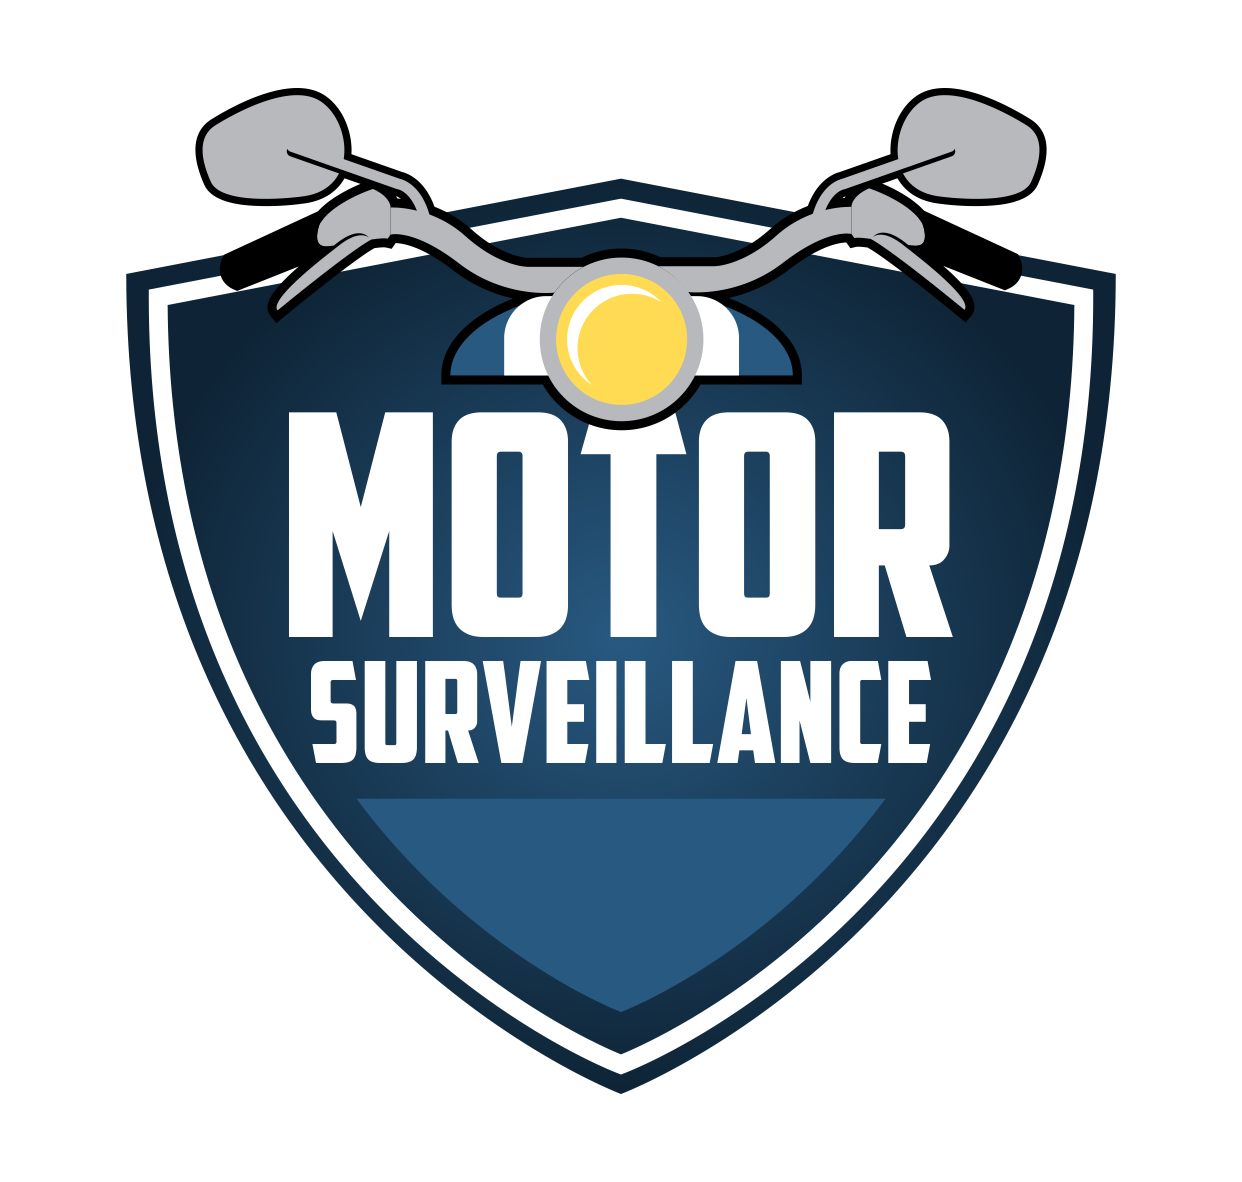 Motorsurveillance.nl